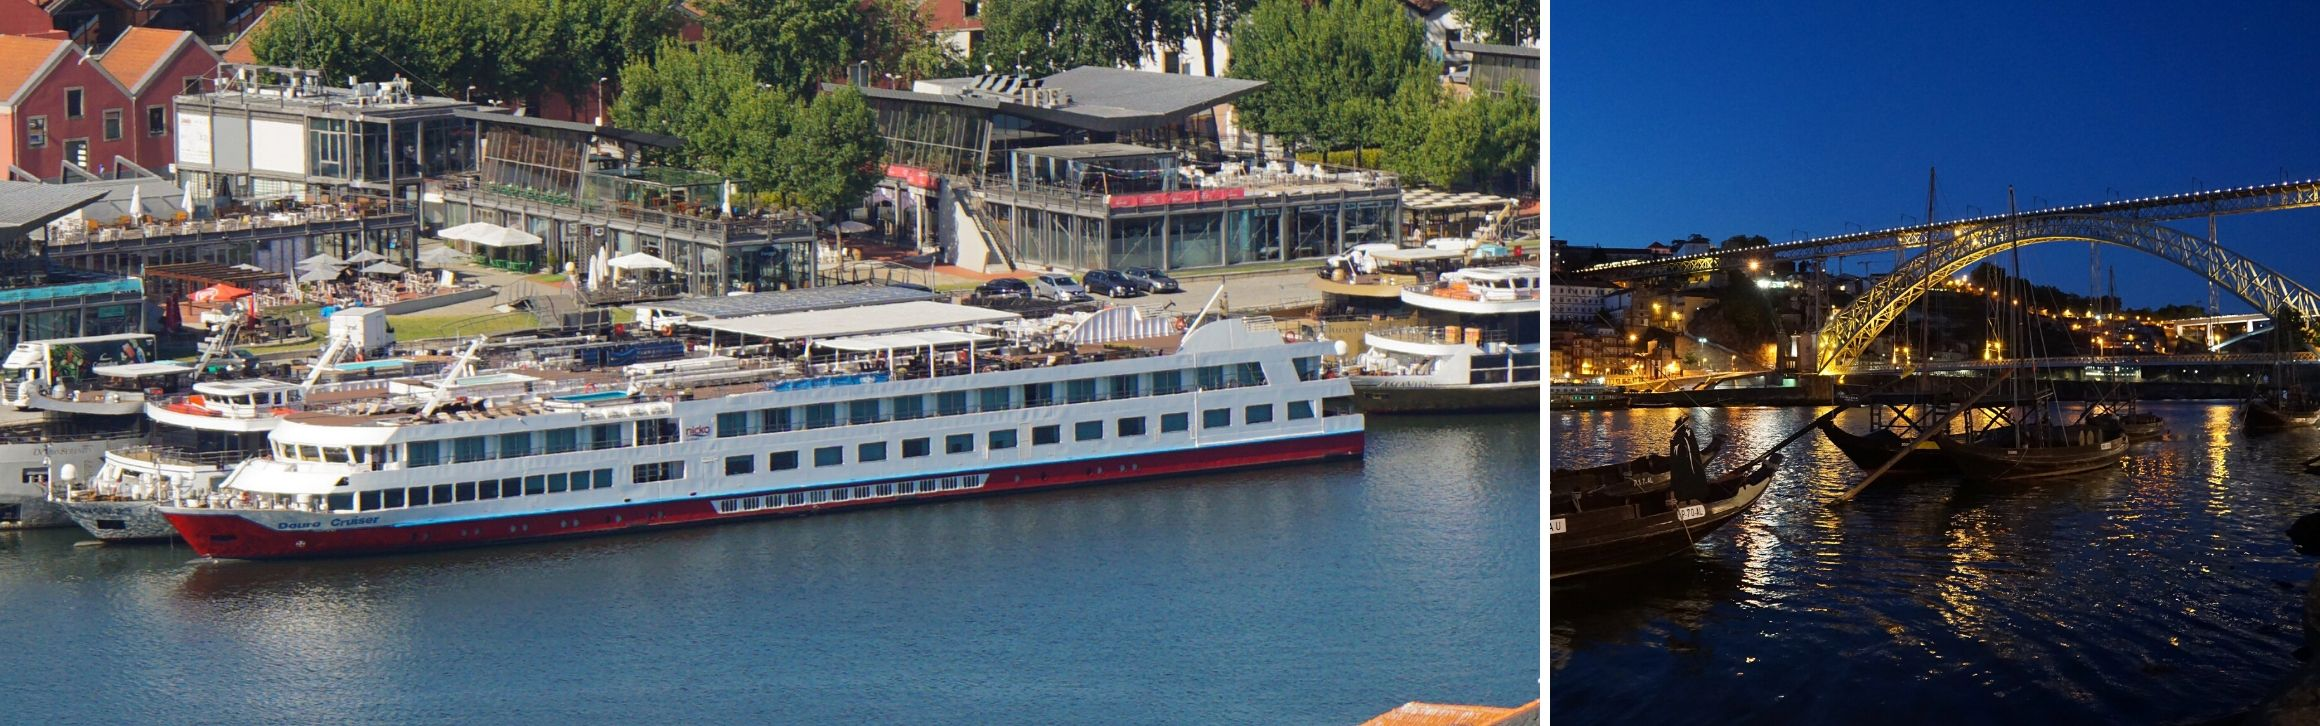 nicko cruises Douro